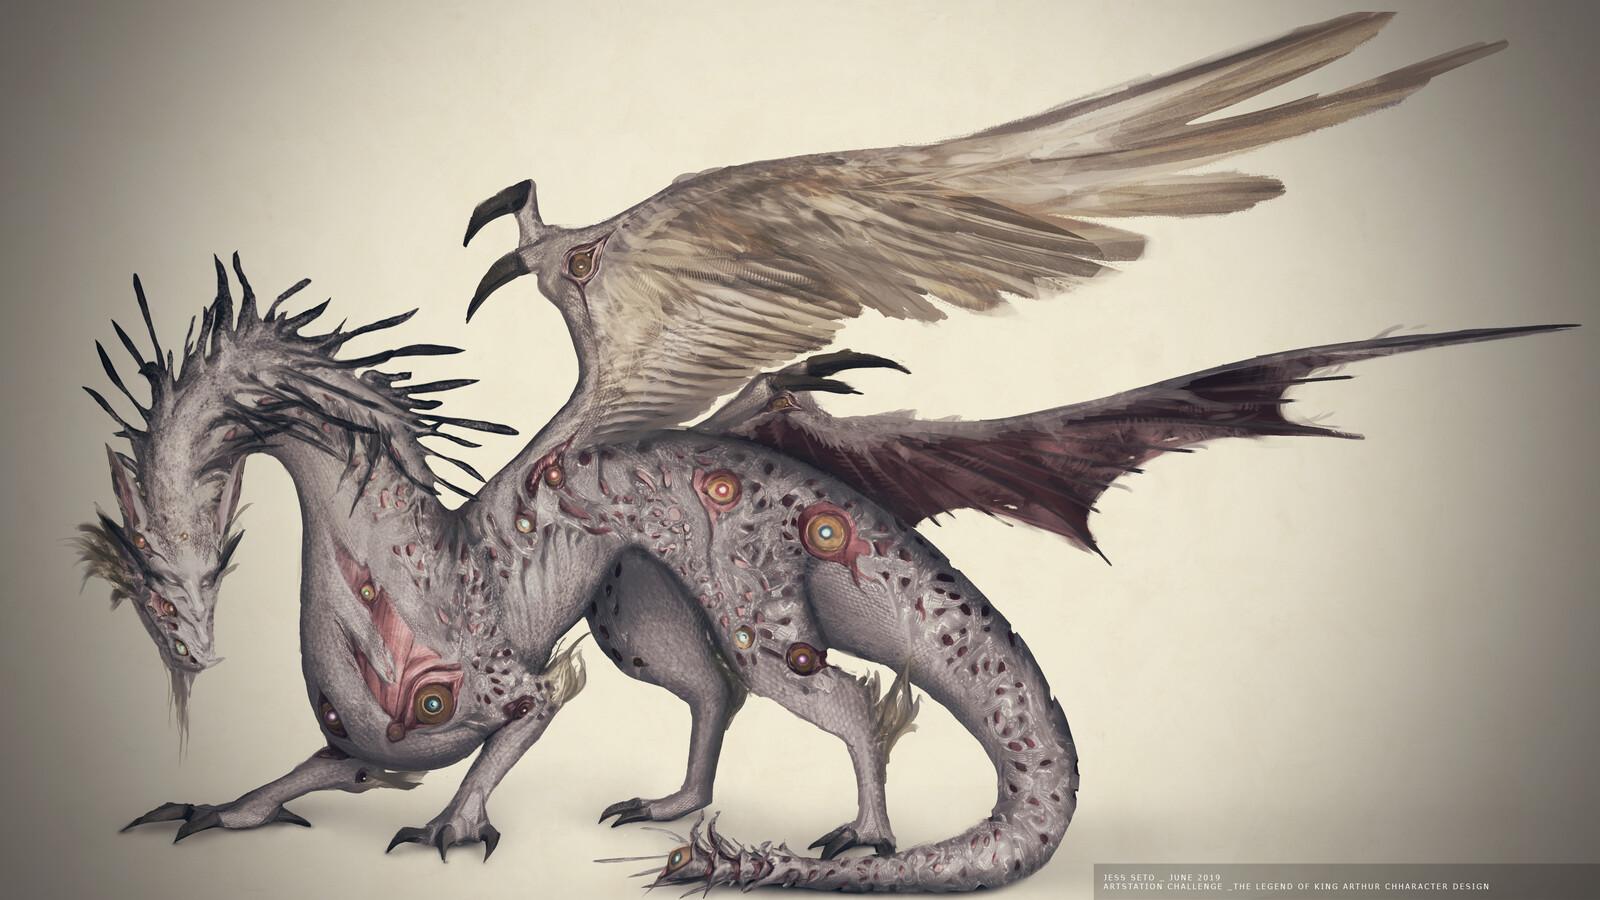 Artstation Challenge The Legend of King Arthur: Dragon